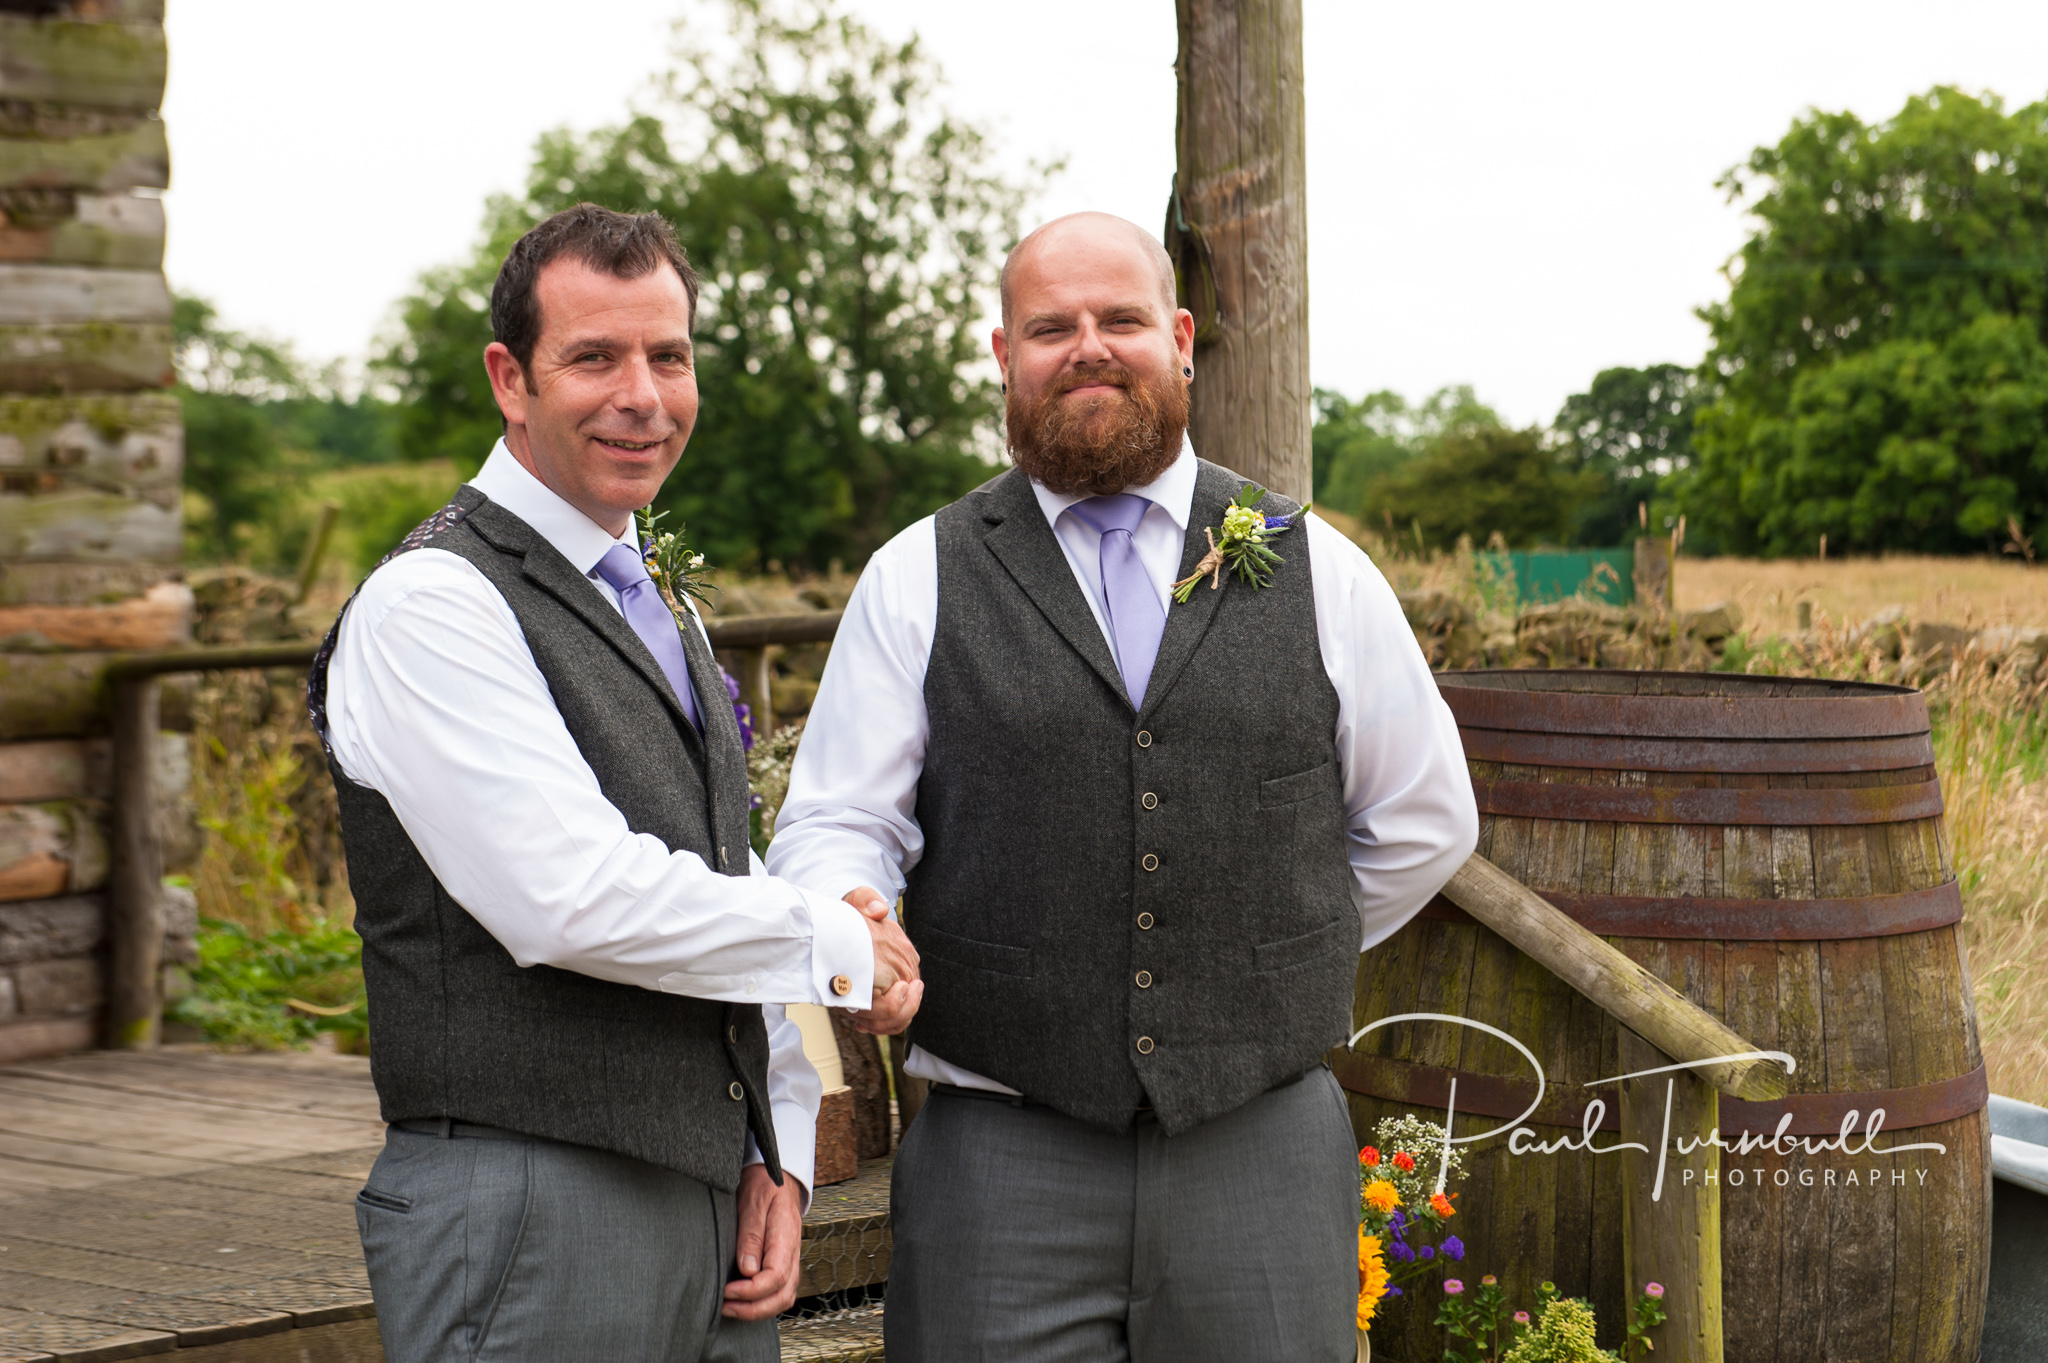 wedding-photographer-hilltop-farm-ilton-yorkshire-006.jpg